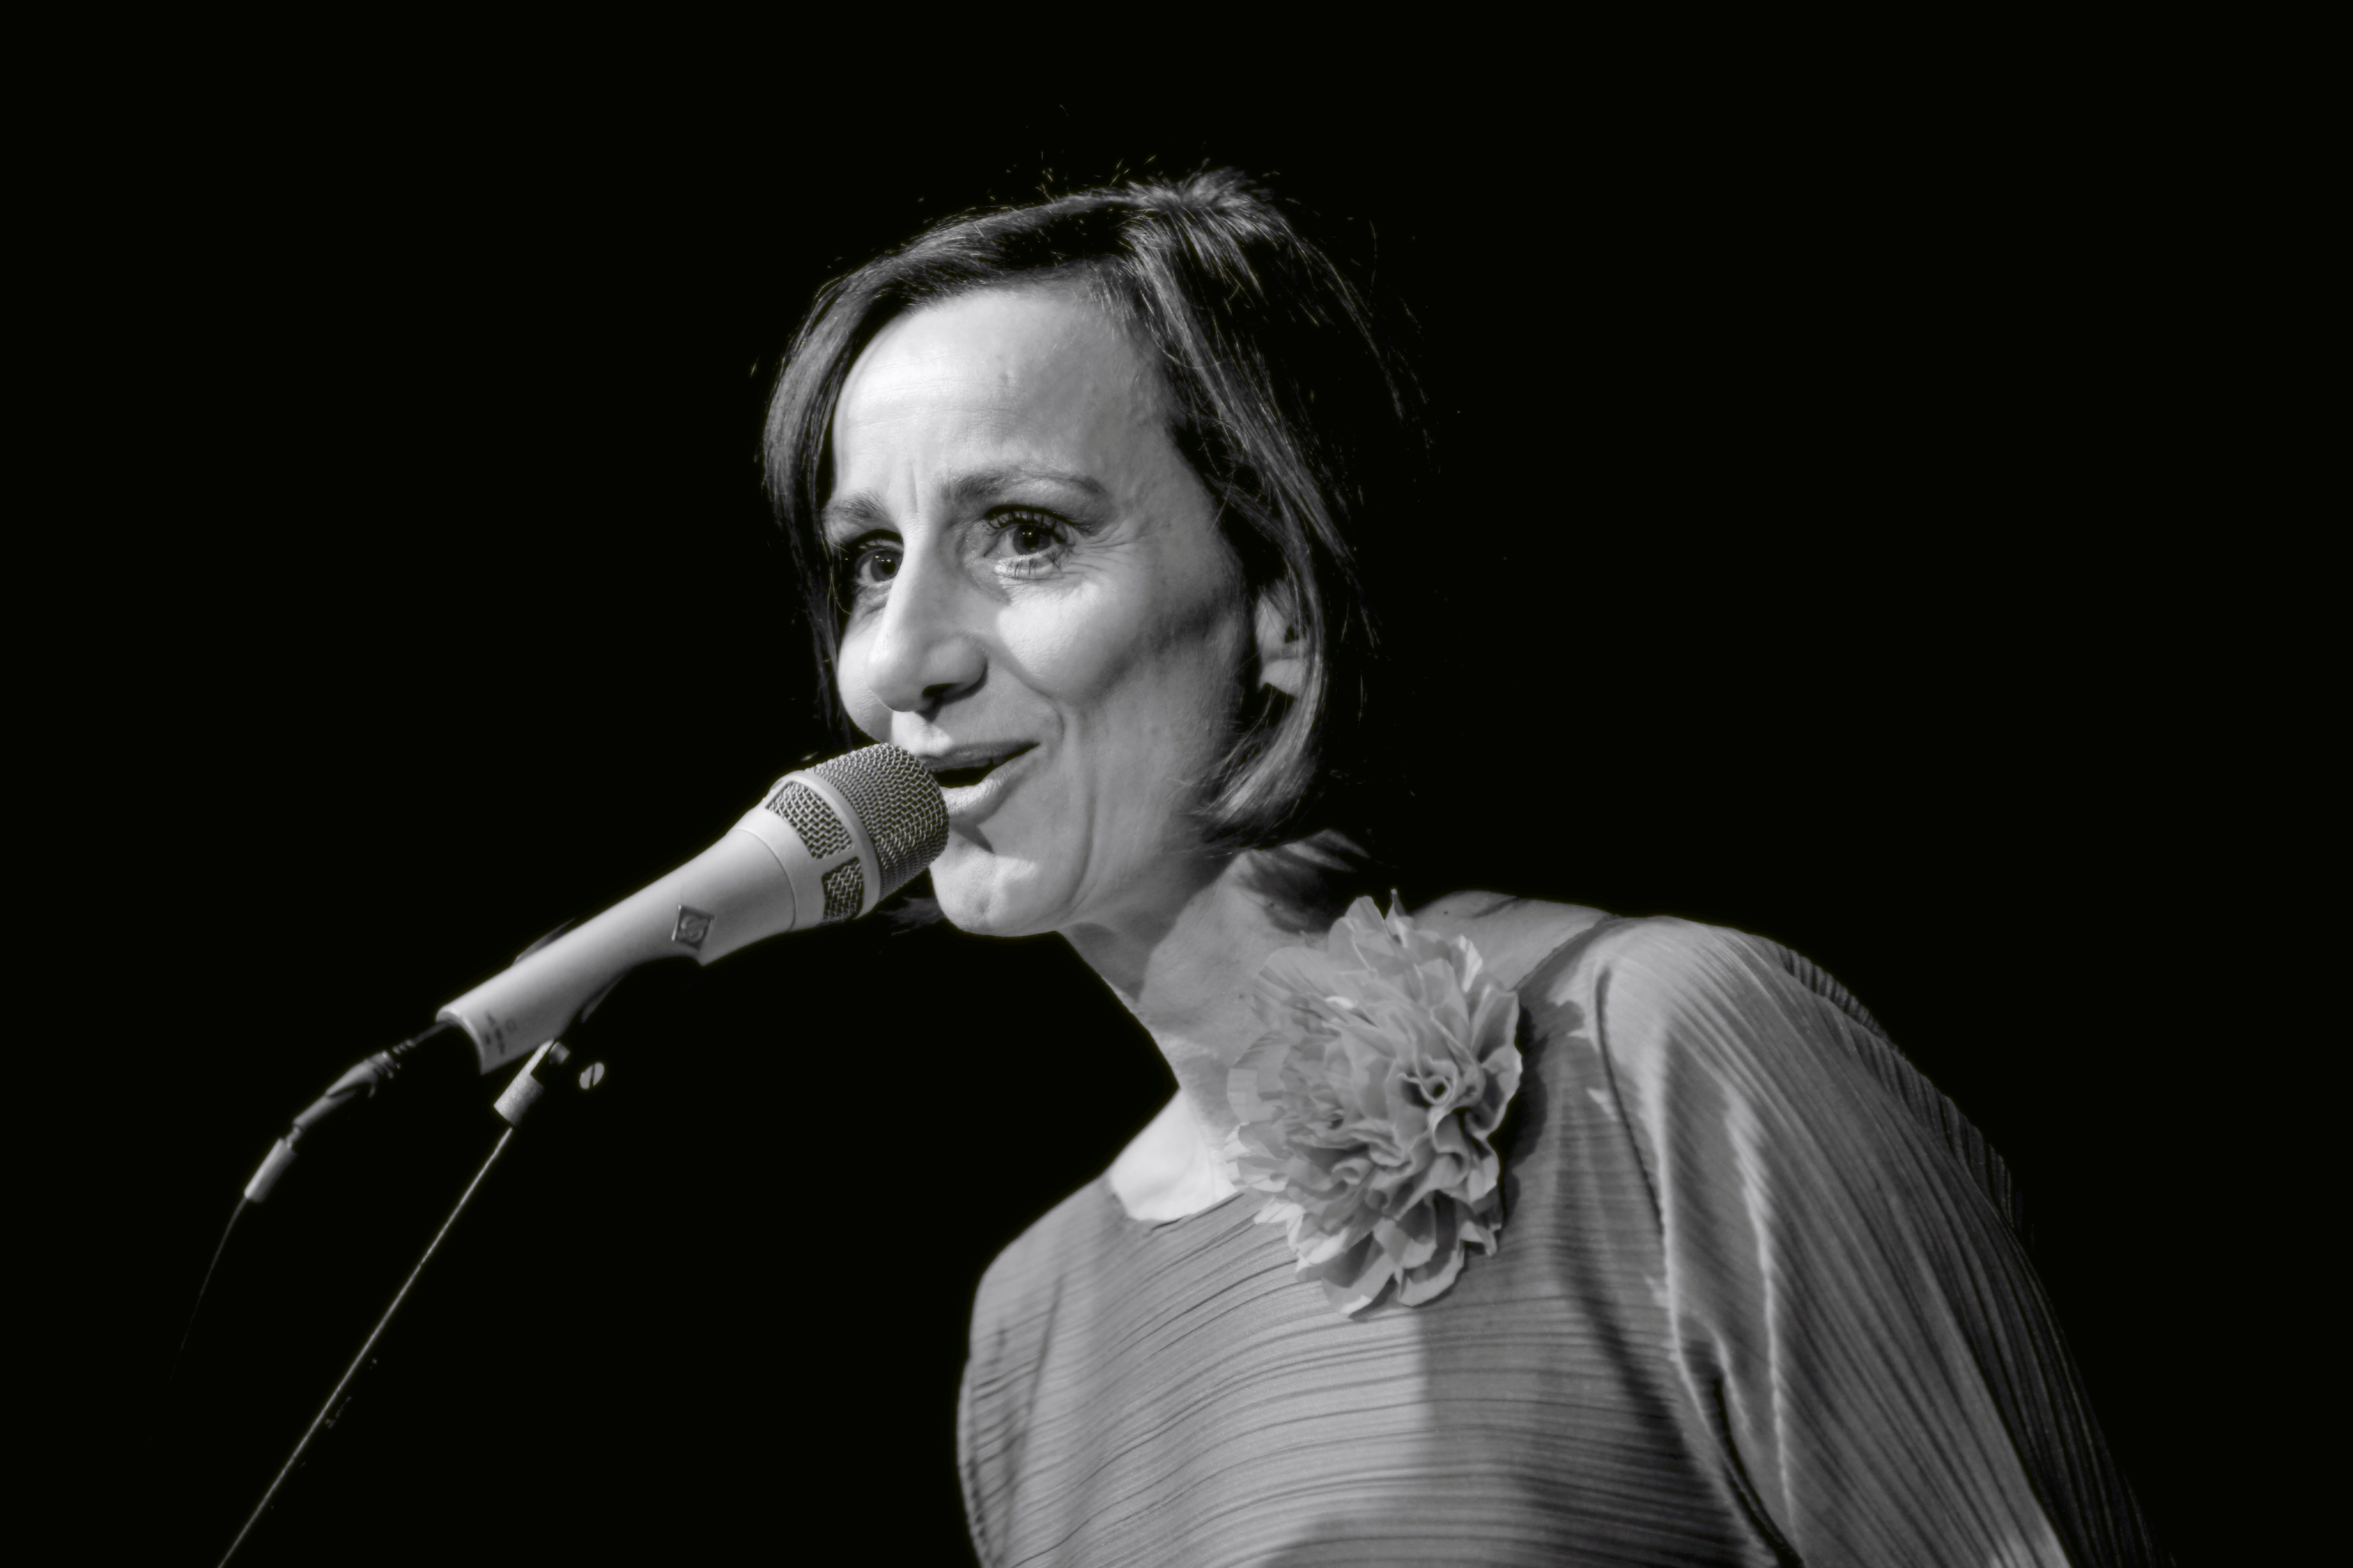 Zuerich ZH, 30.10.2016, Jellici/Baldes, Soundfields im Moods. Foto: Moritz Hager